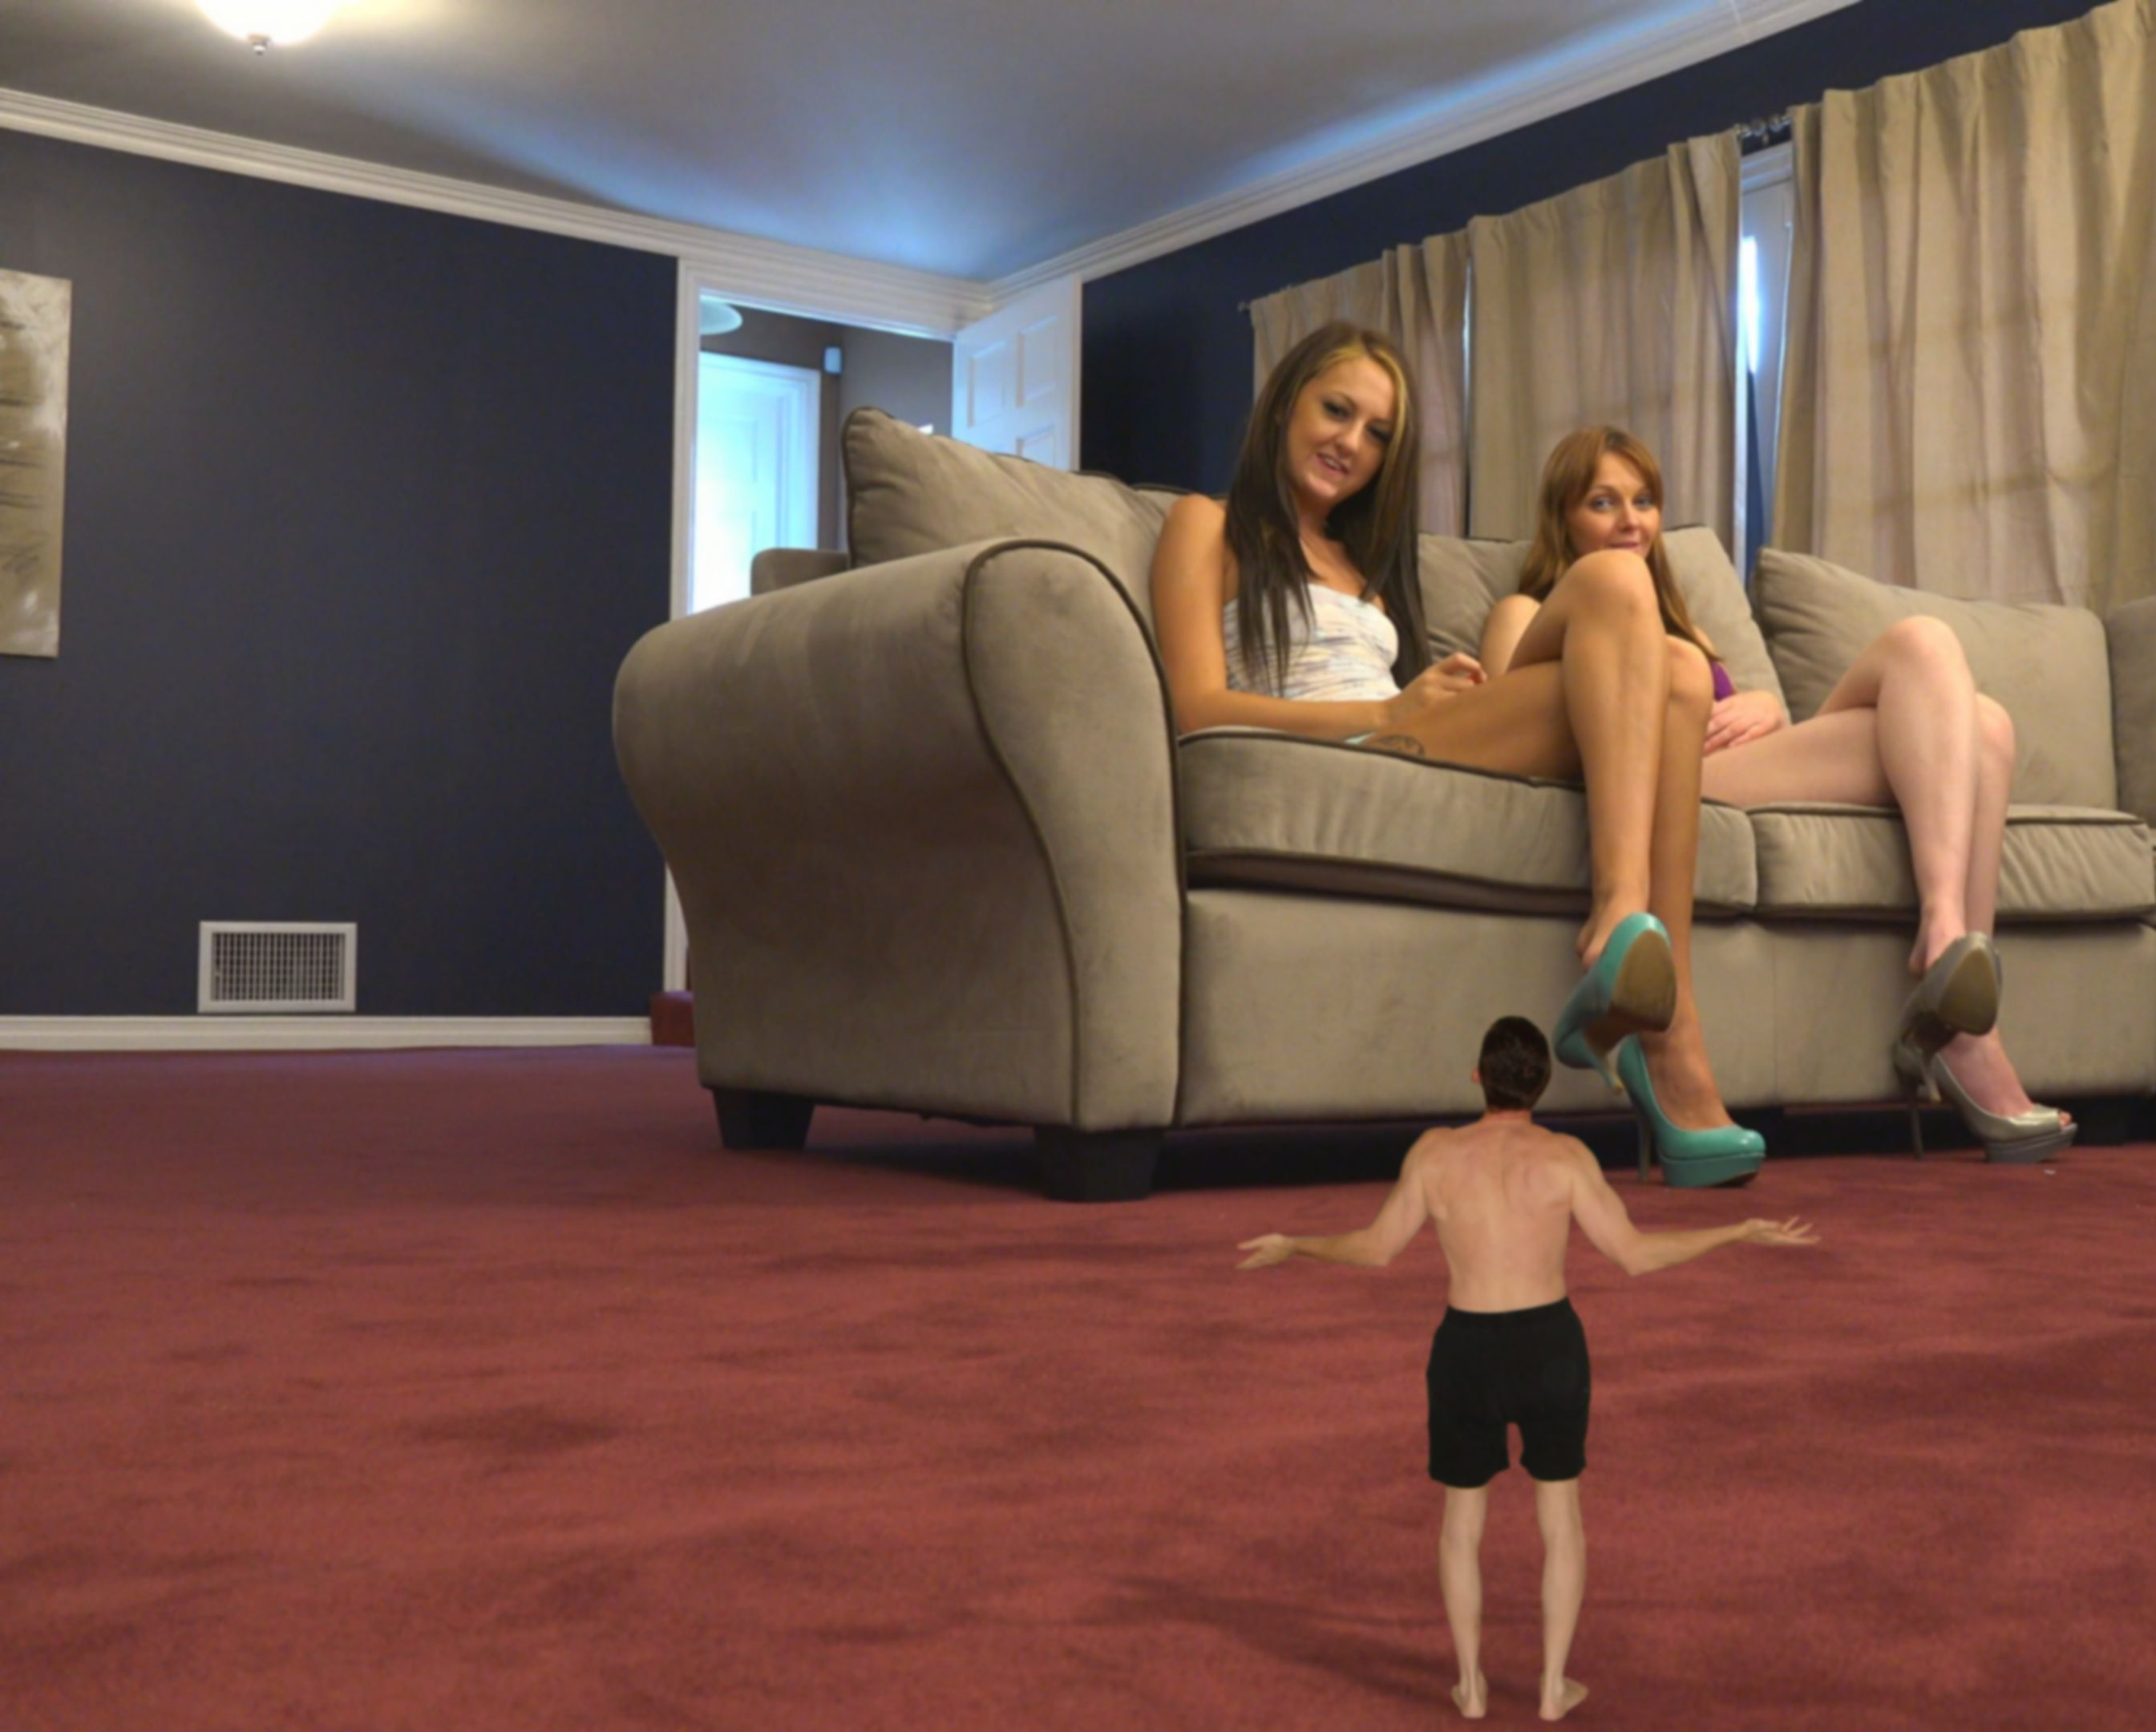 Movie shrunken man big girl — img 7